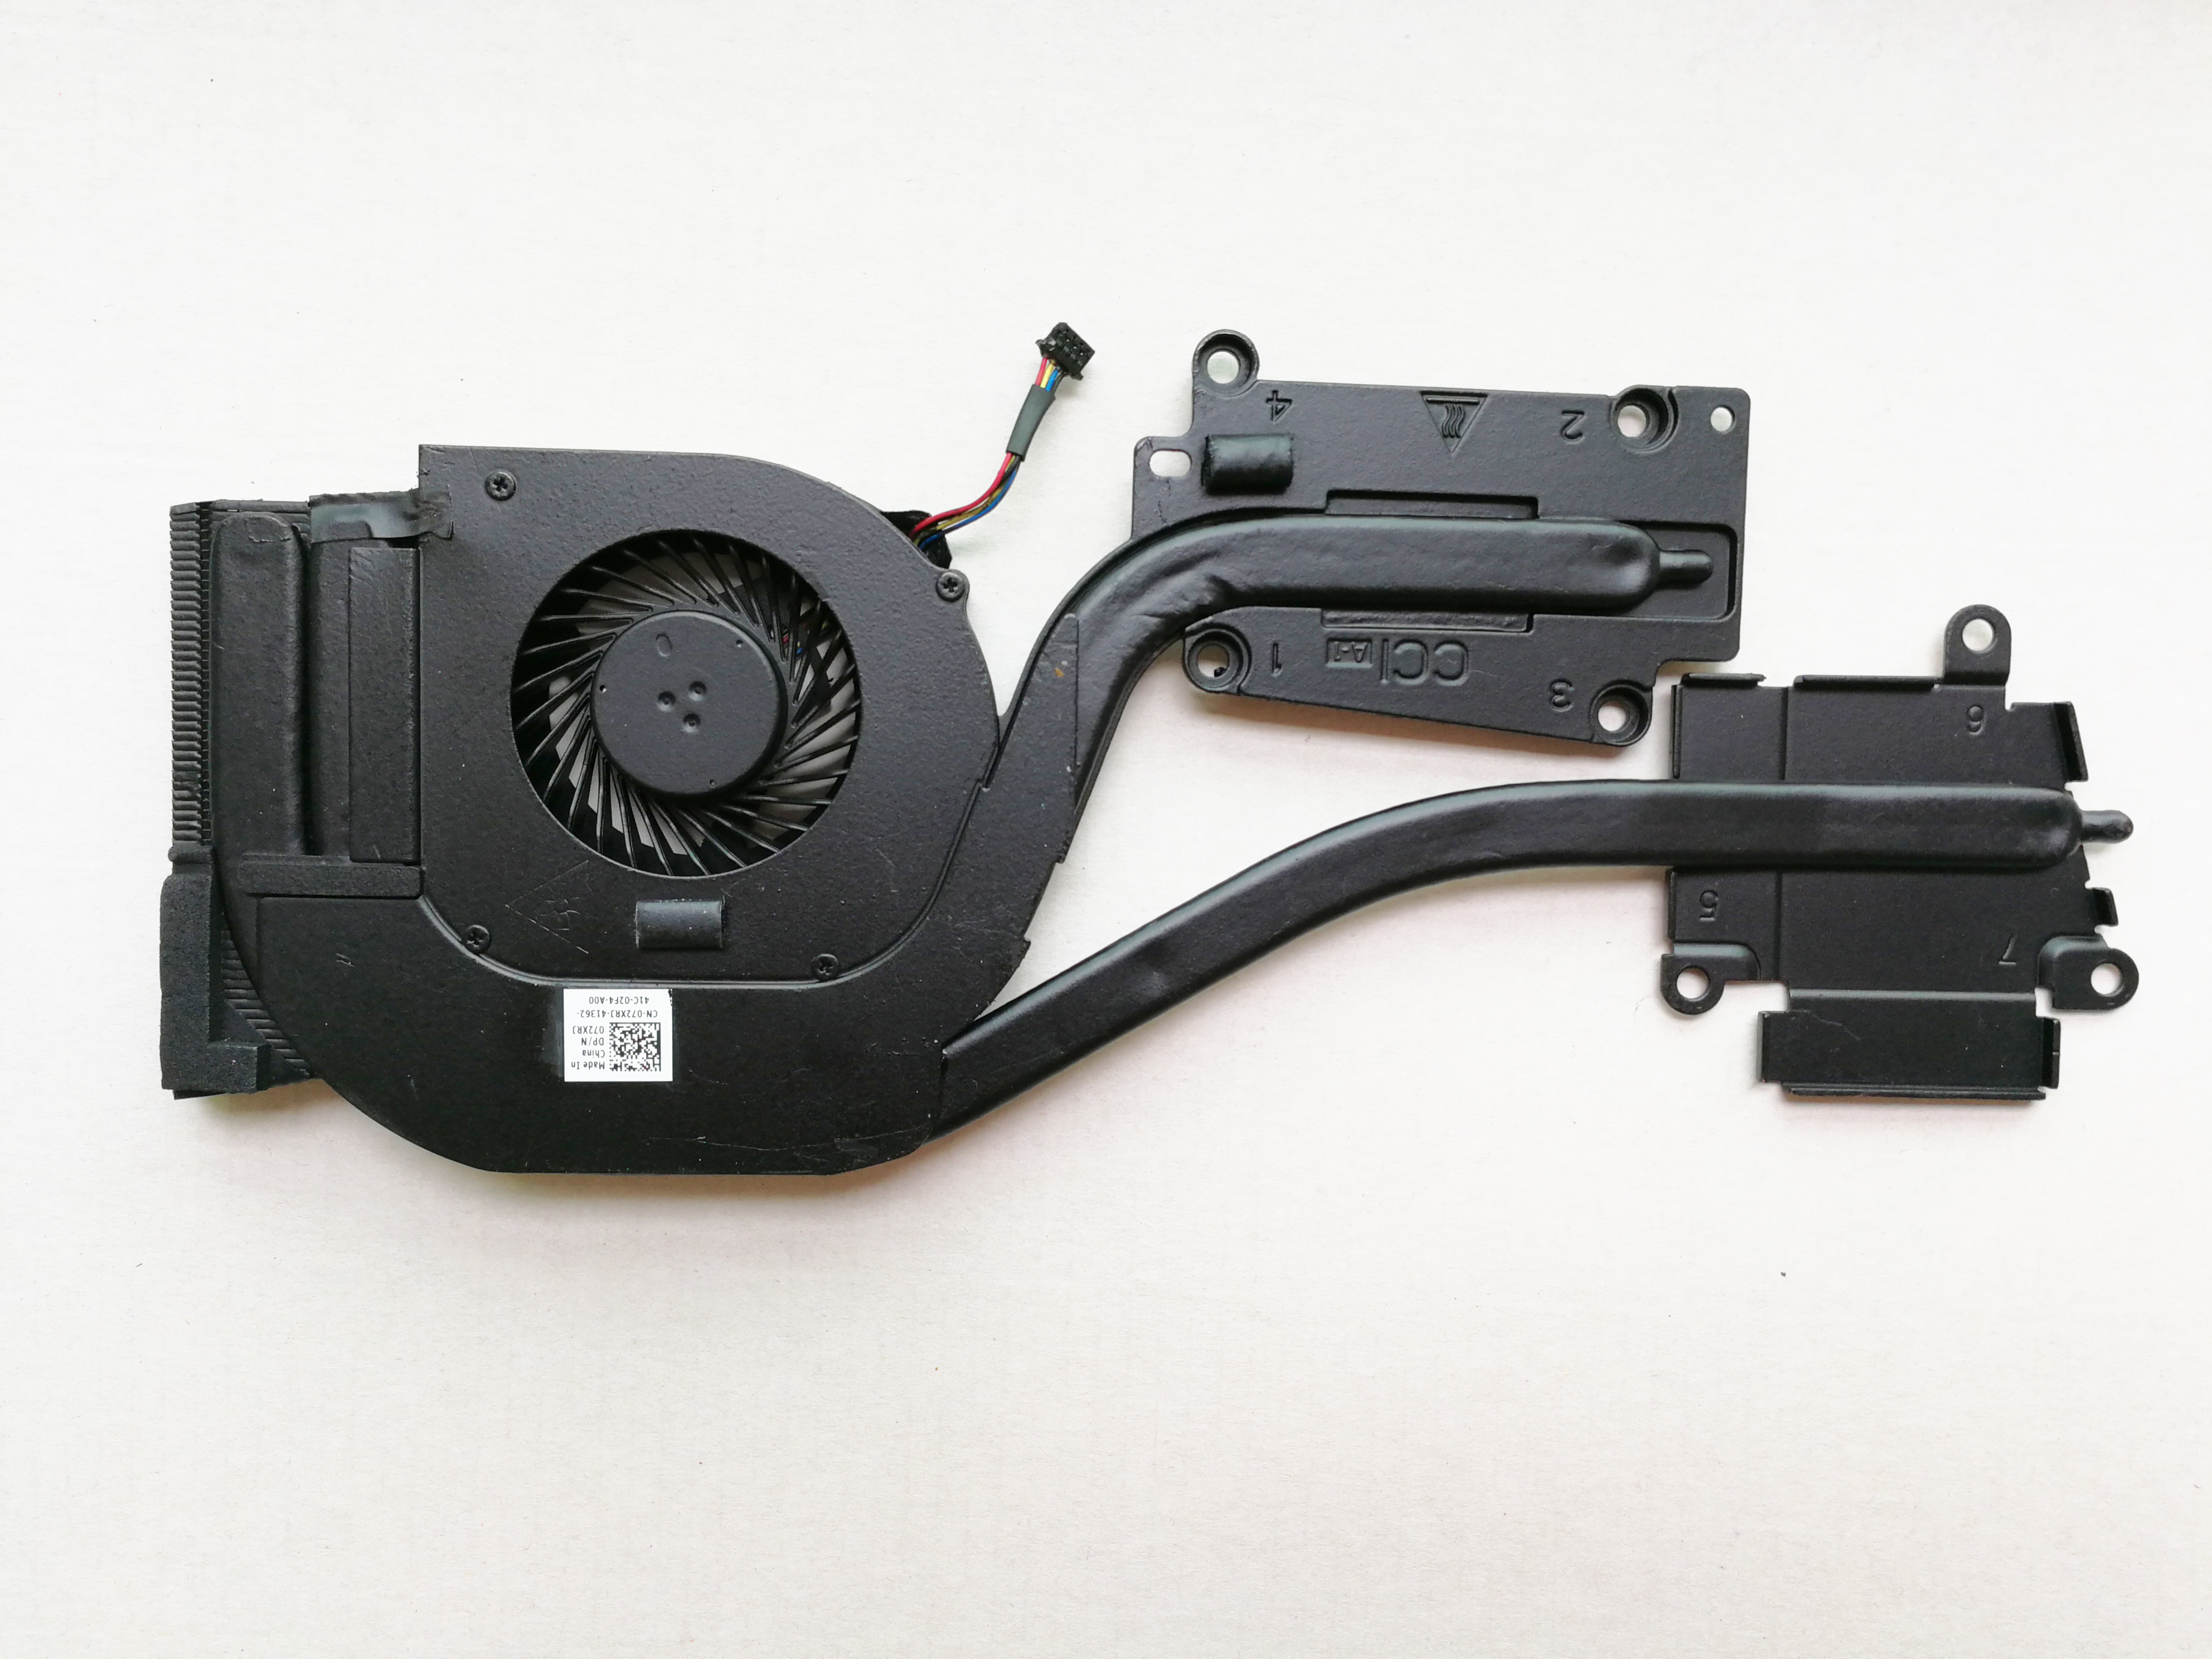 Оригинальный вентилятор для Dell Latitude E6540 радиатор 072XRJ cn-072XRJ 72XRJ